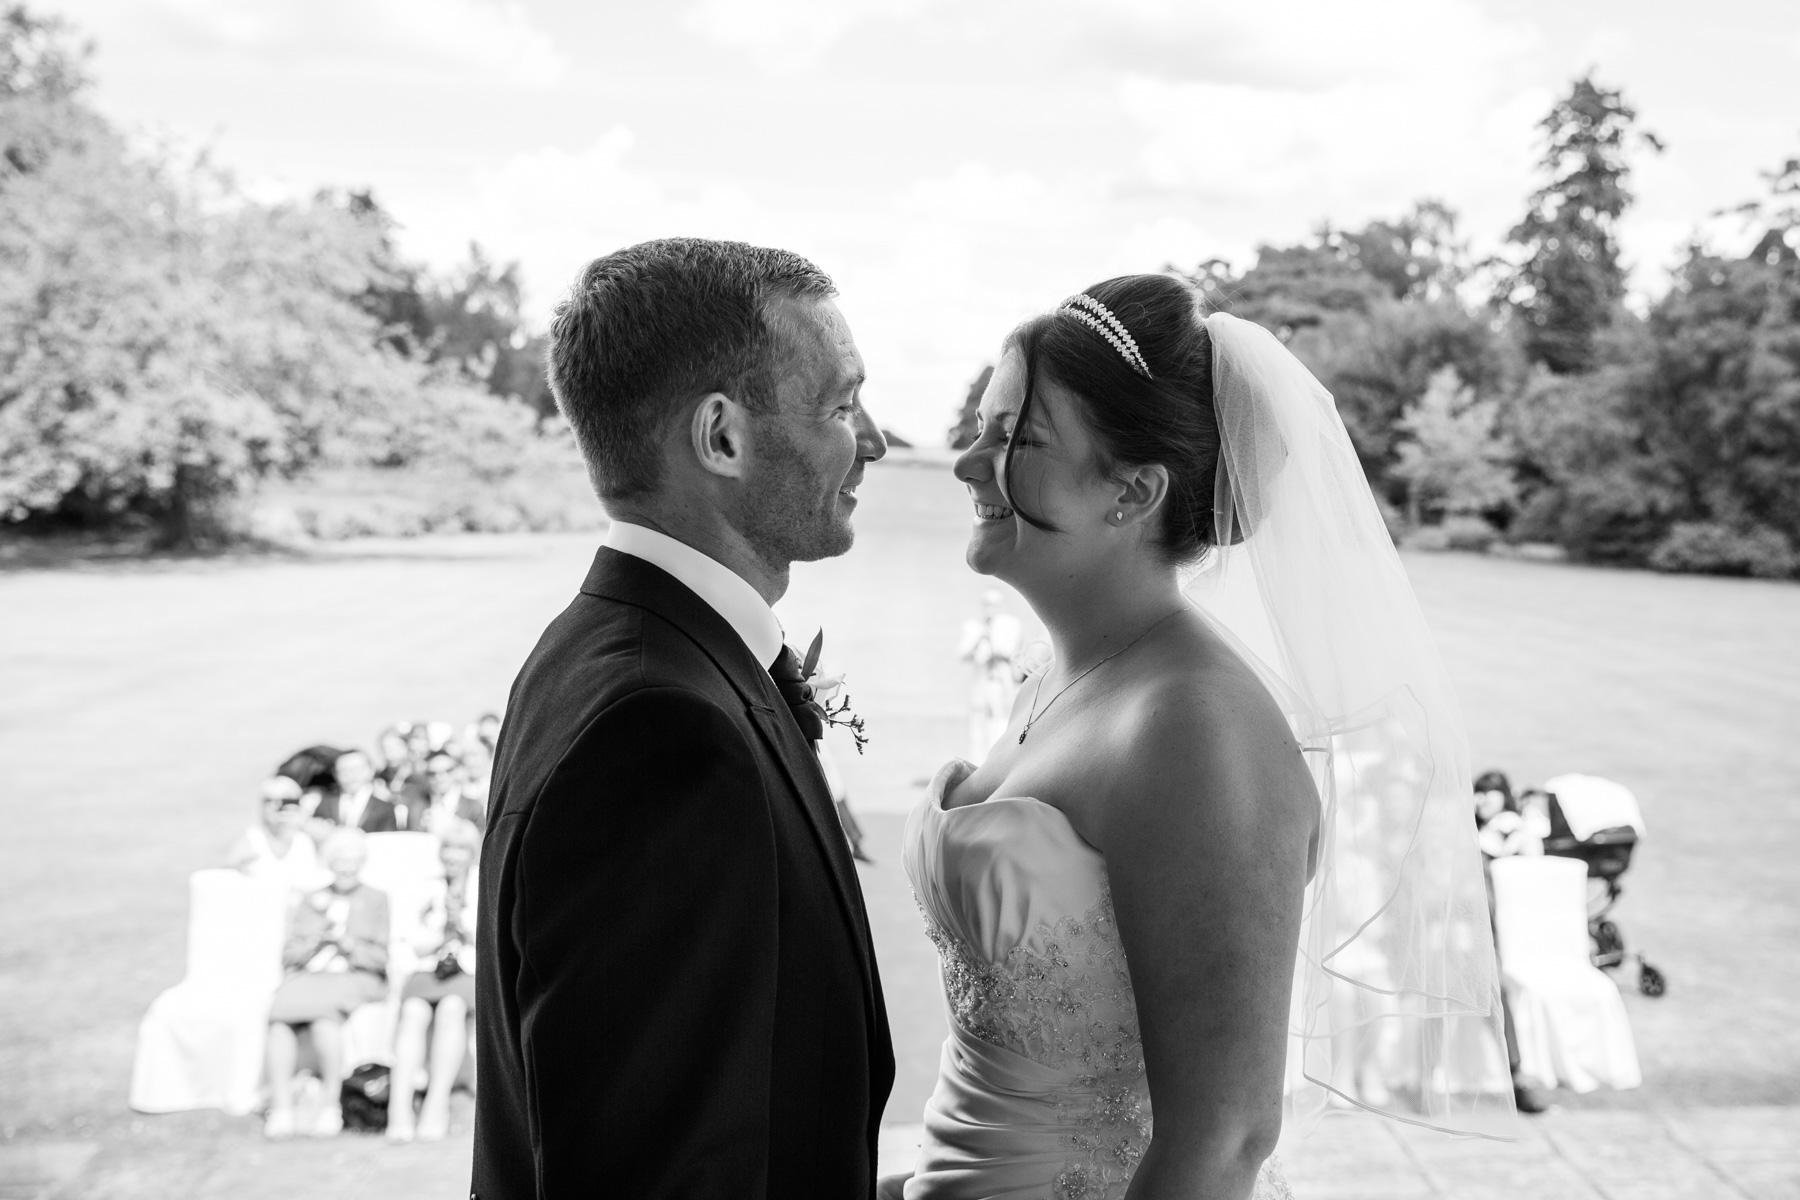 Sussex wedding photography Richard Murgatroyd Buxted Park Hotel